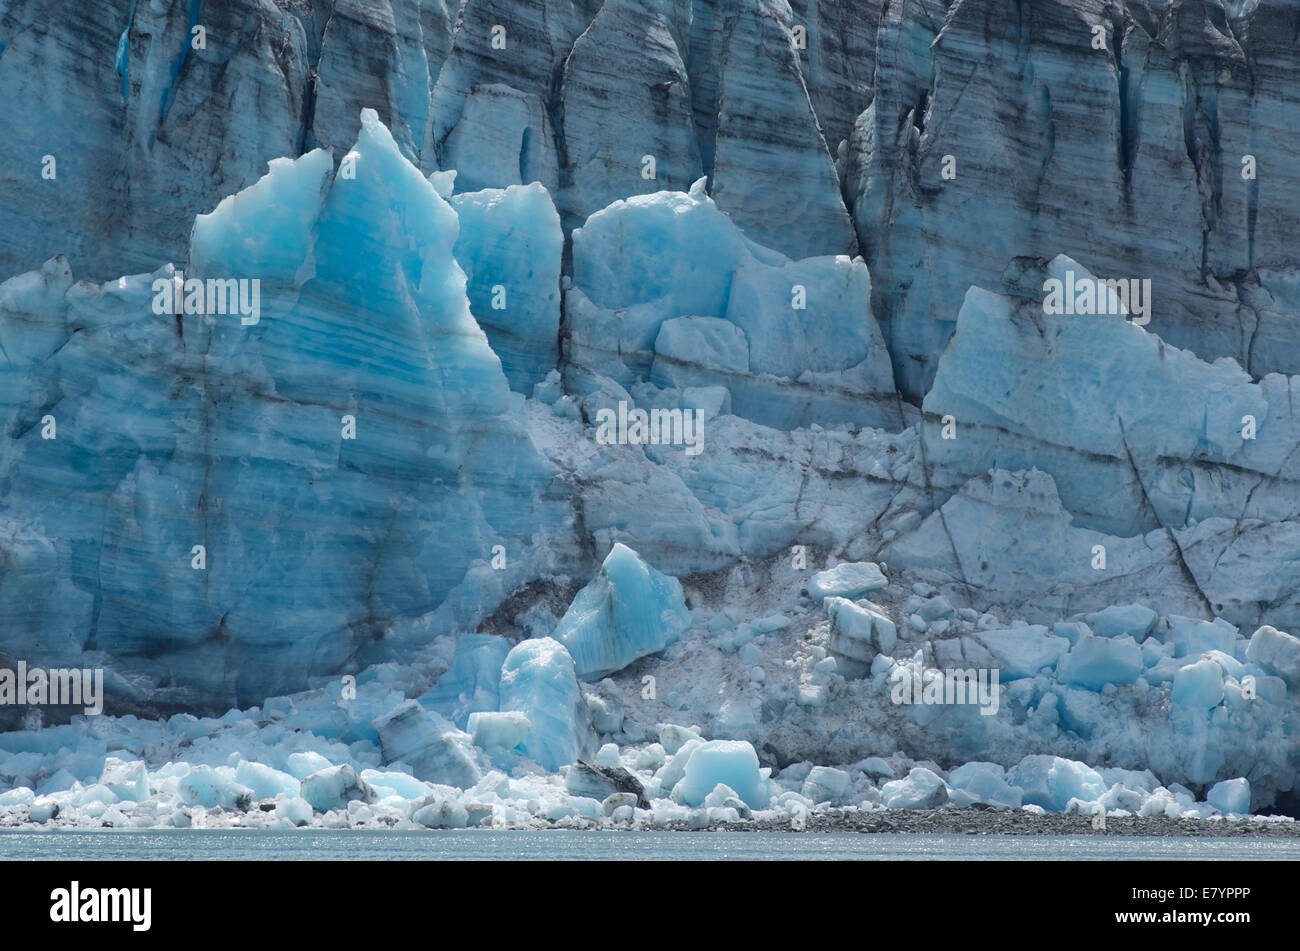 A horizontal slice of the deep blue Johns Hopkins Glacier in Glacier Bay, Alaska. - Stock Image